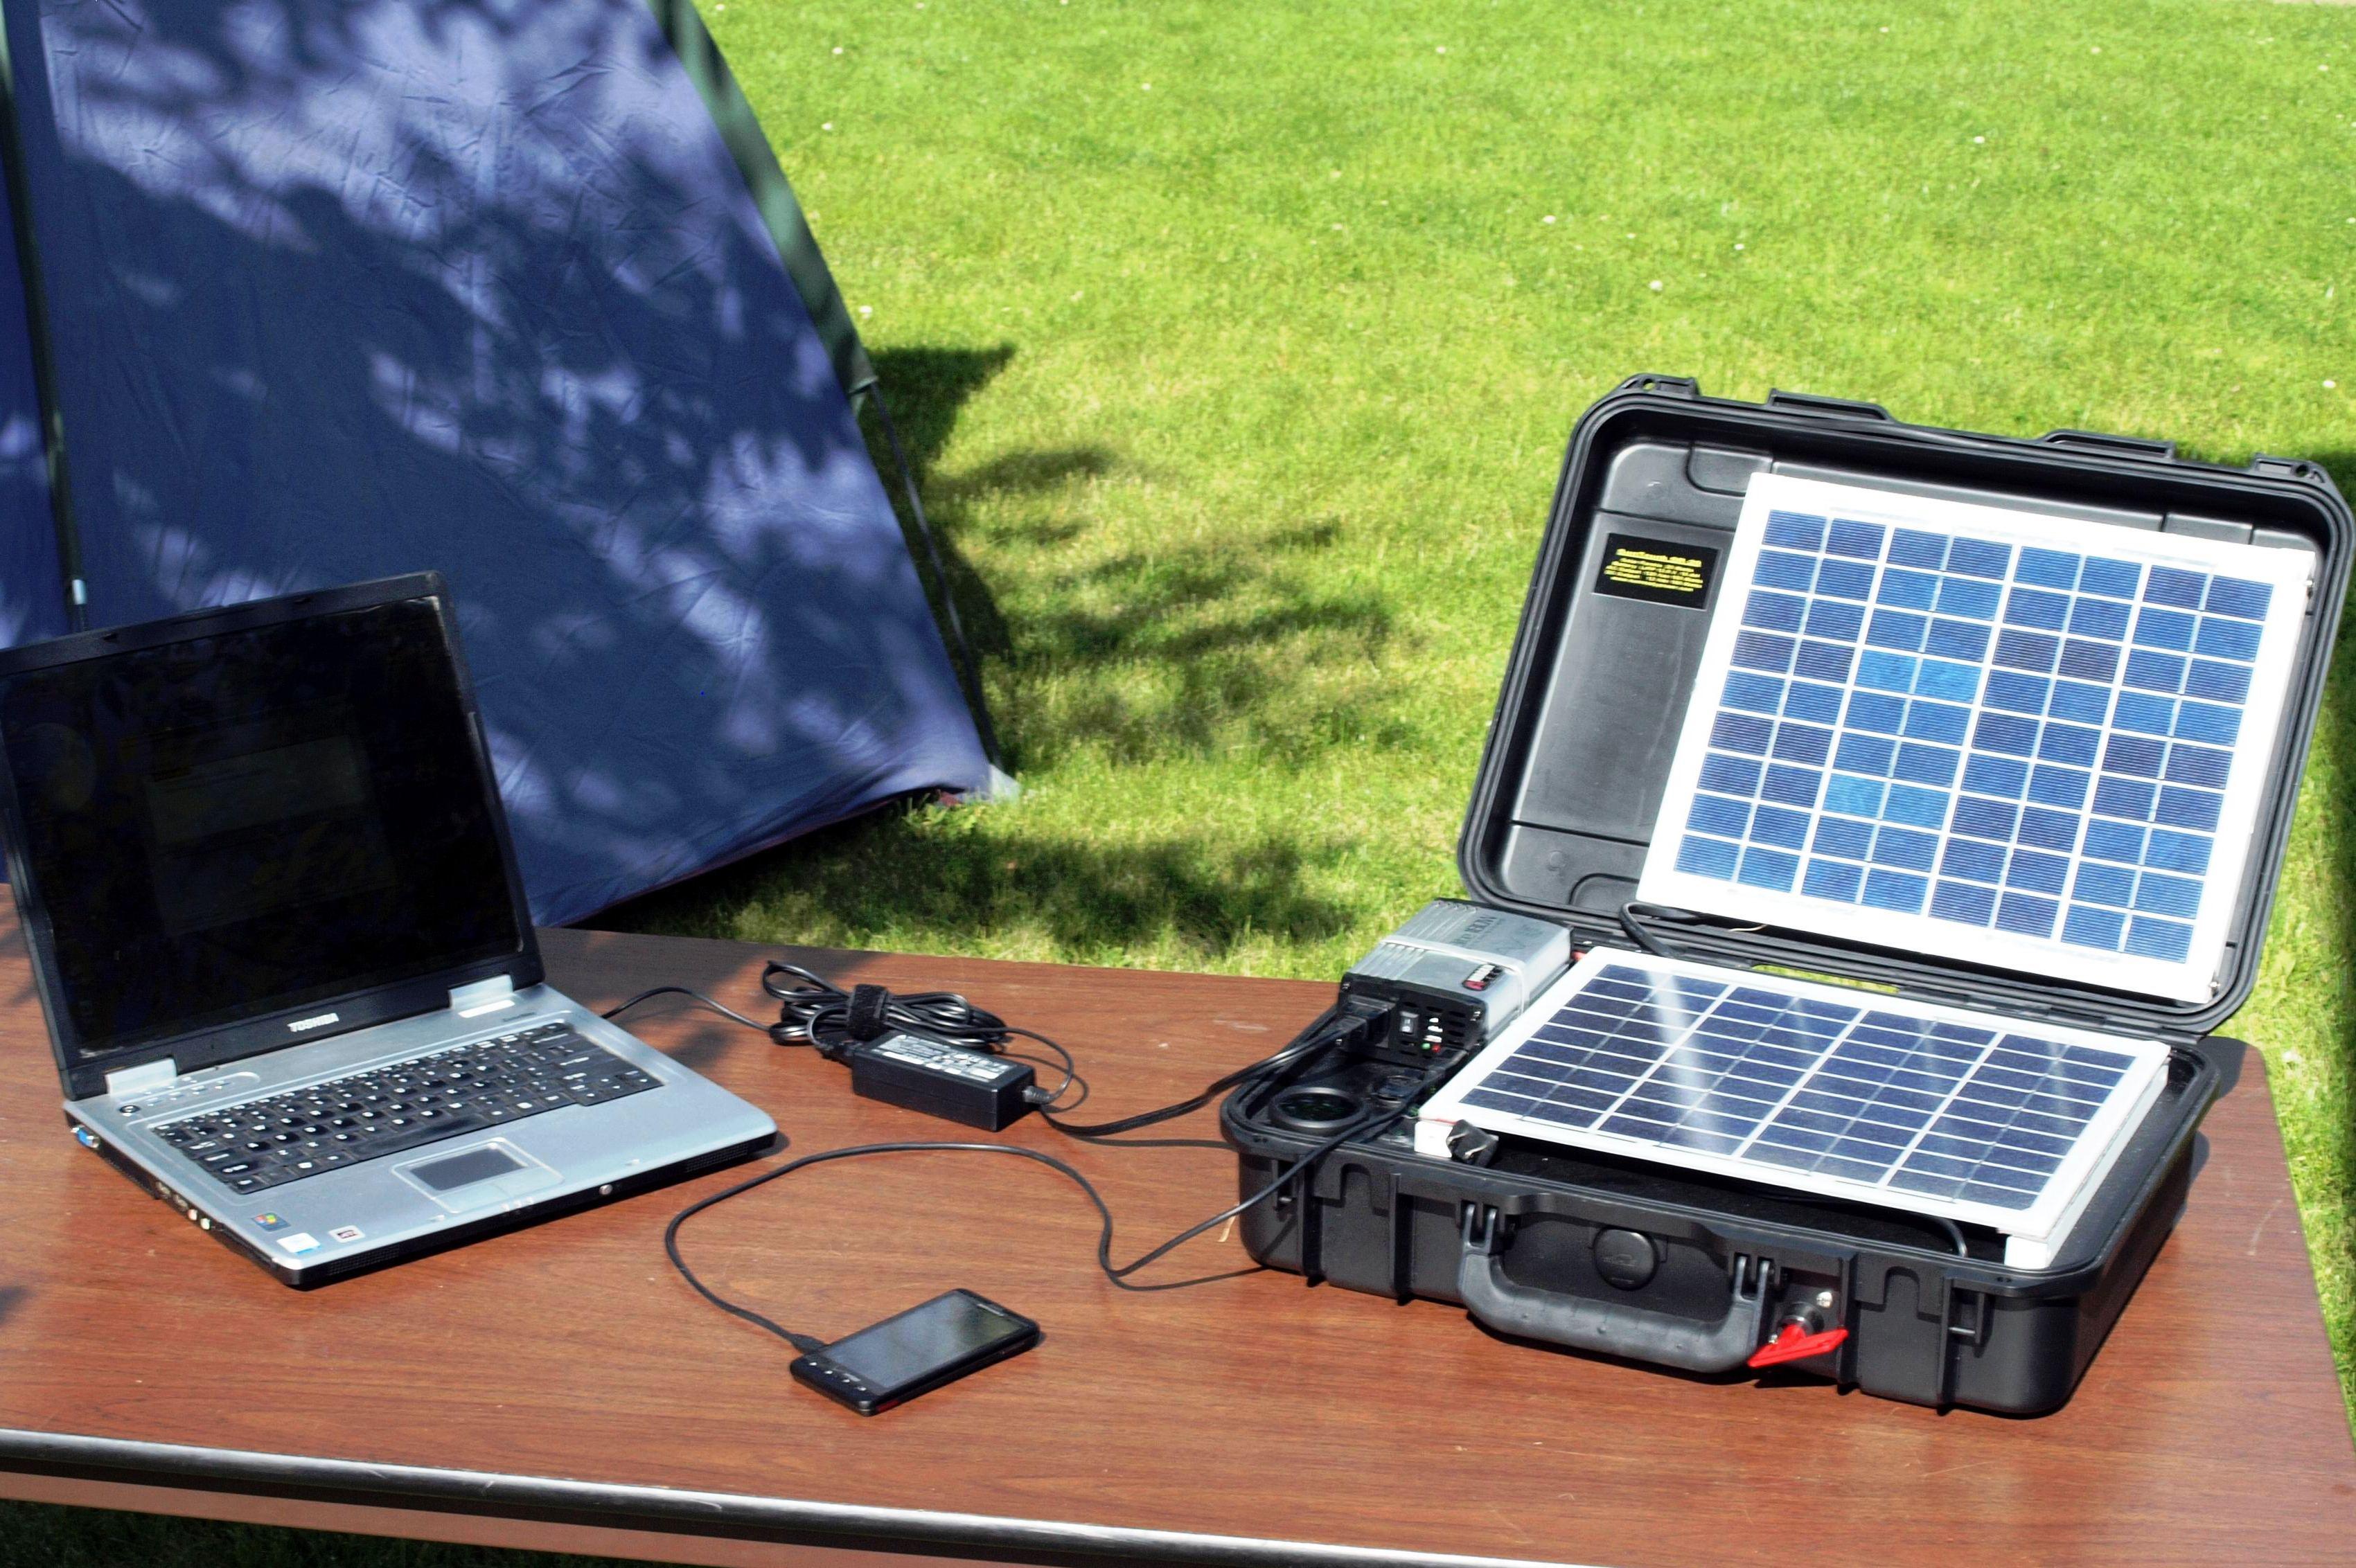 Fotovoltaico portatile l 39 energia in una valigetta - Fotovoltaico portatile ...